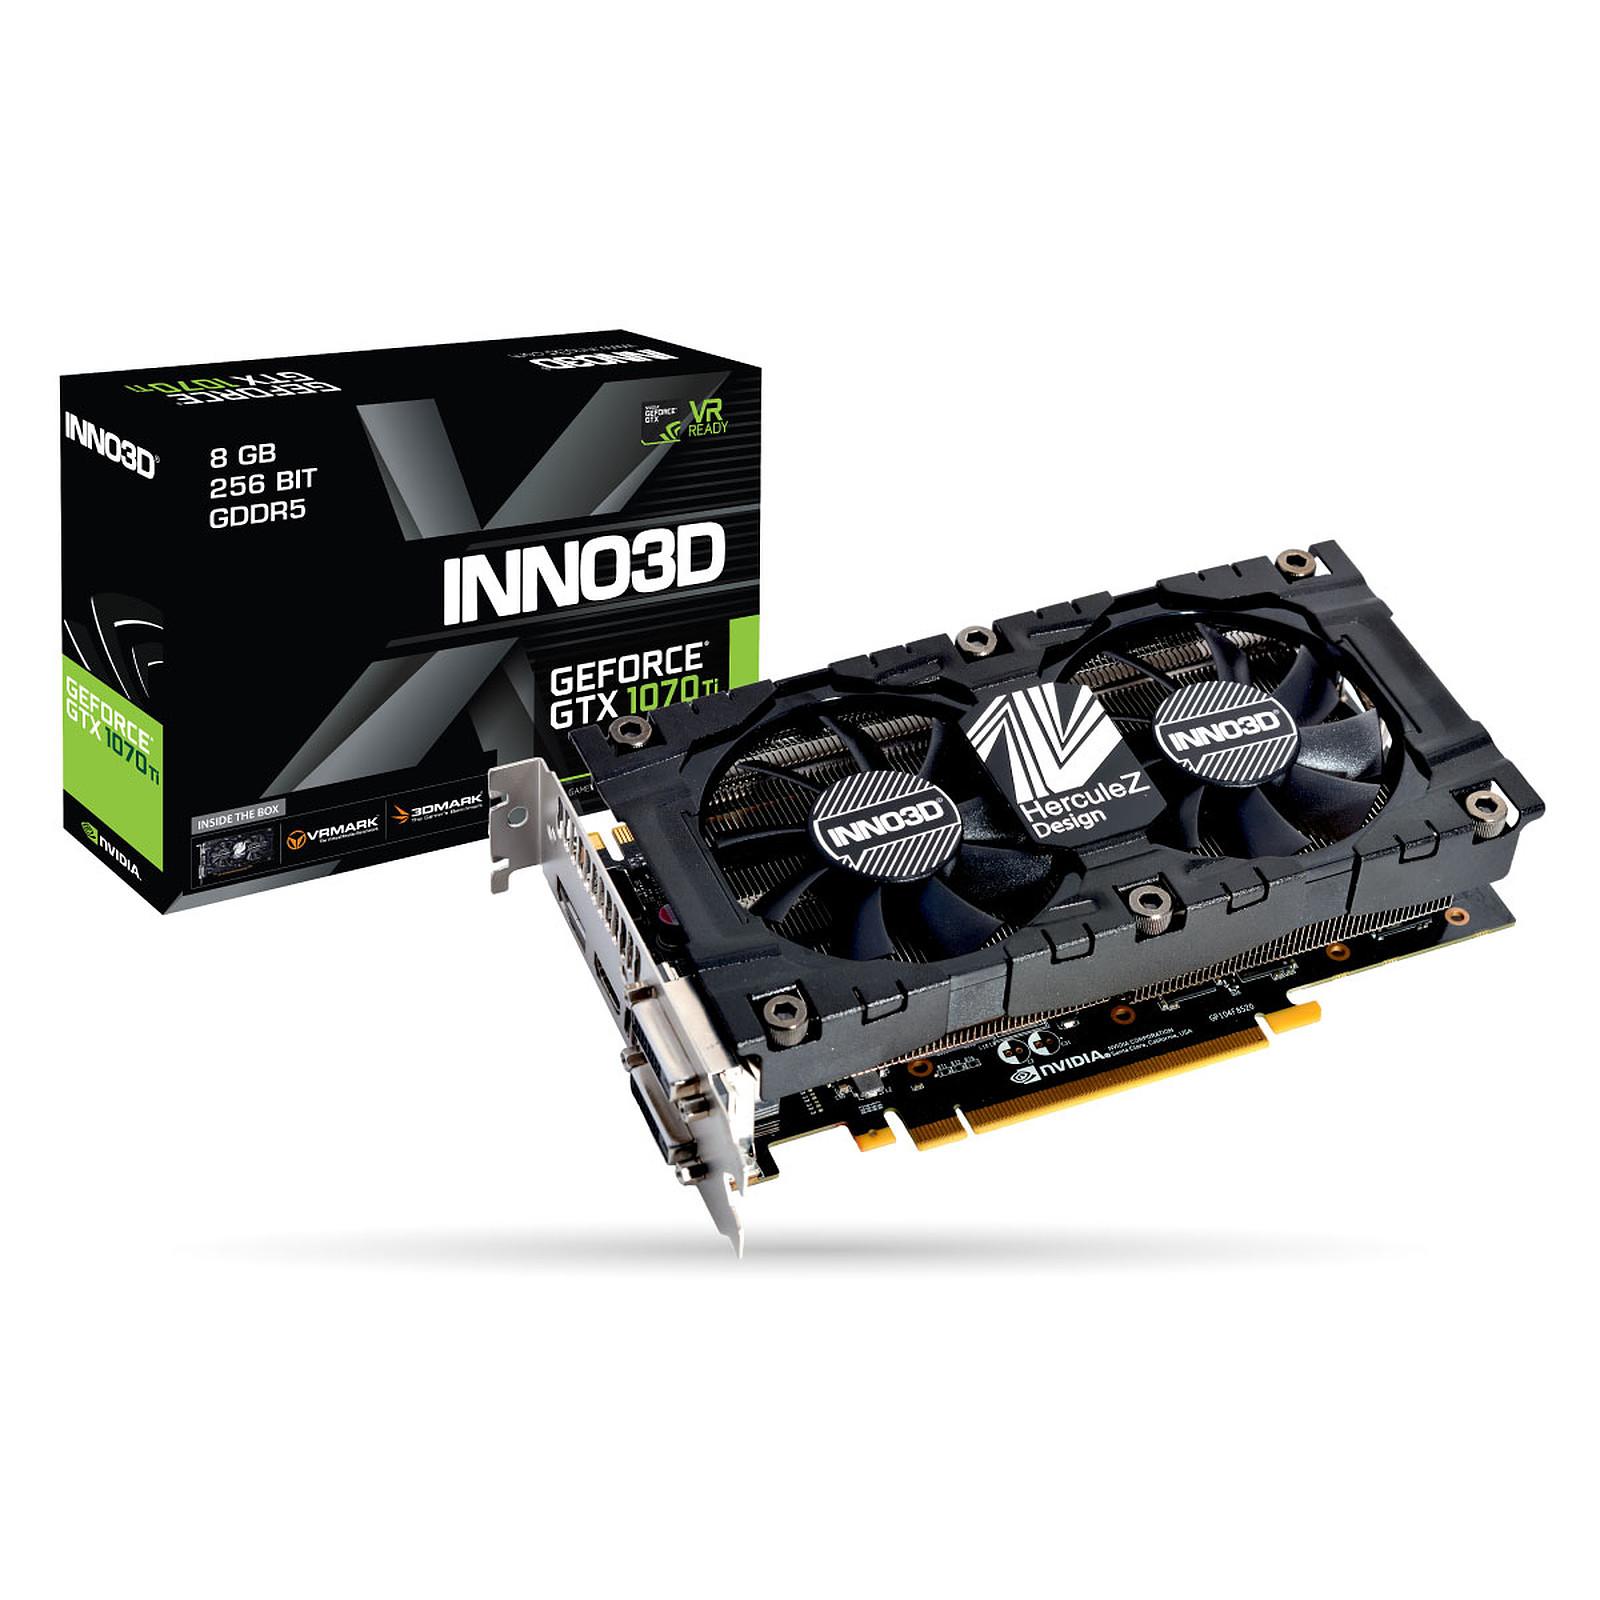 INNO3D GeForce GTX 1070 Ti TWIN X2 V2